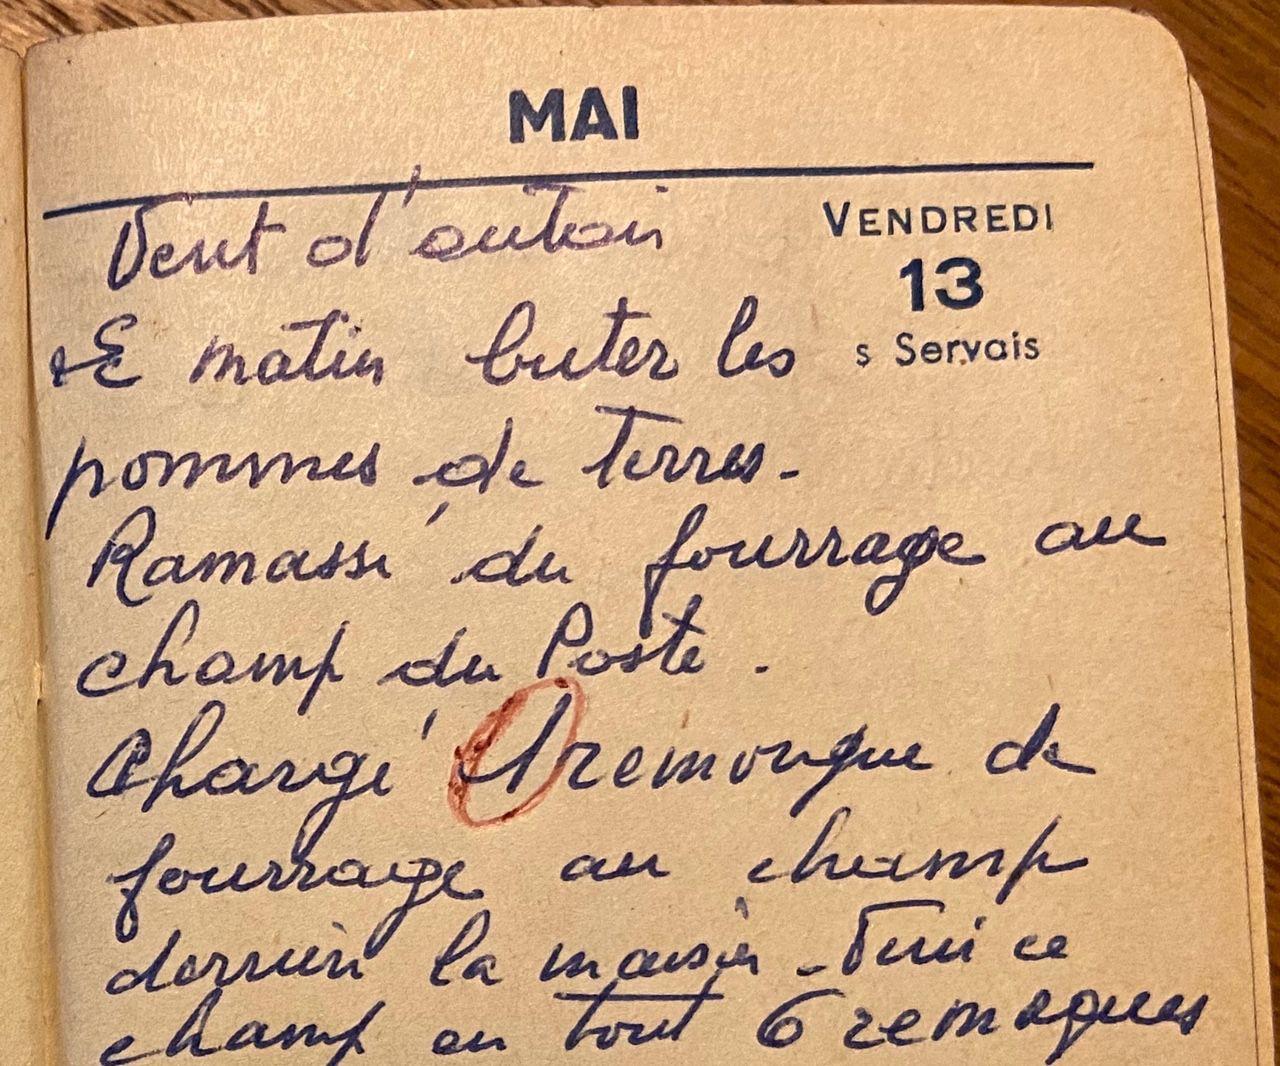 Vendredi 13 mai 1960 - buter les pommes de terre